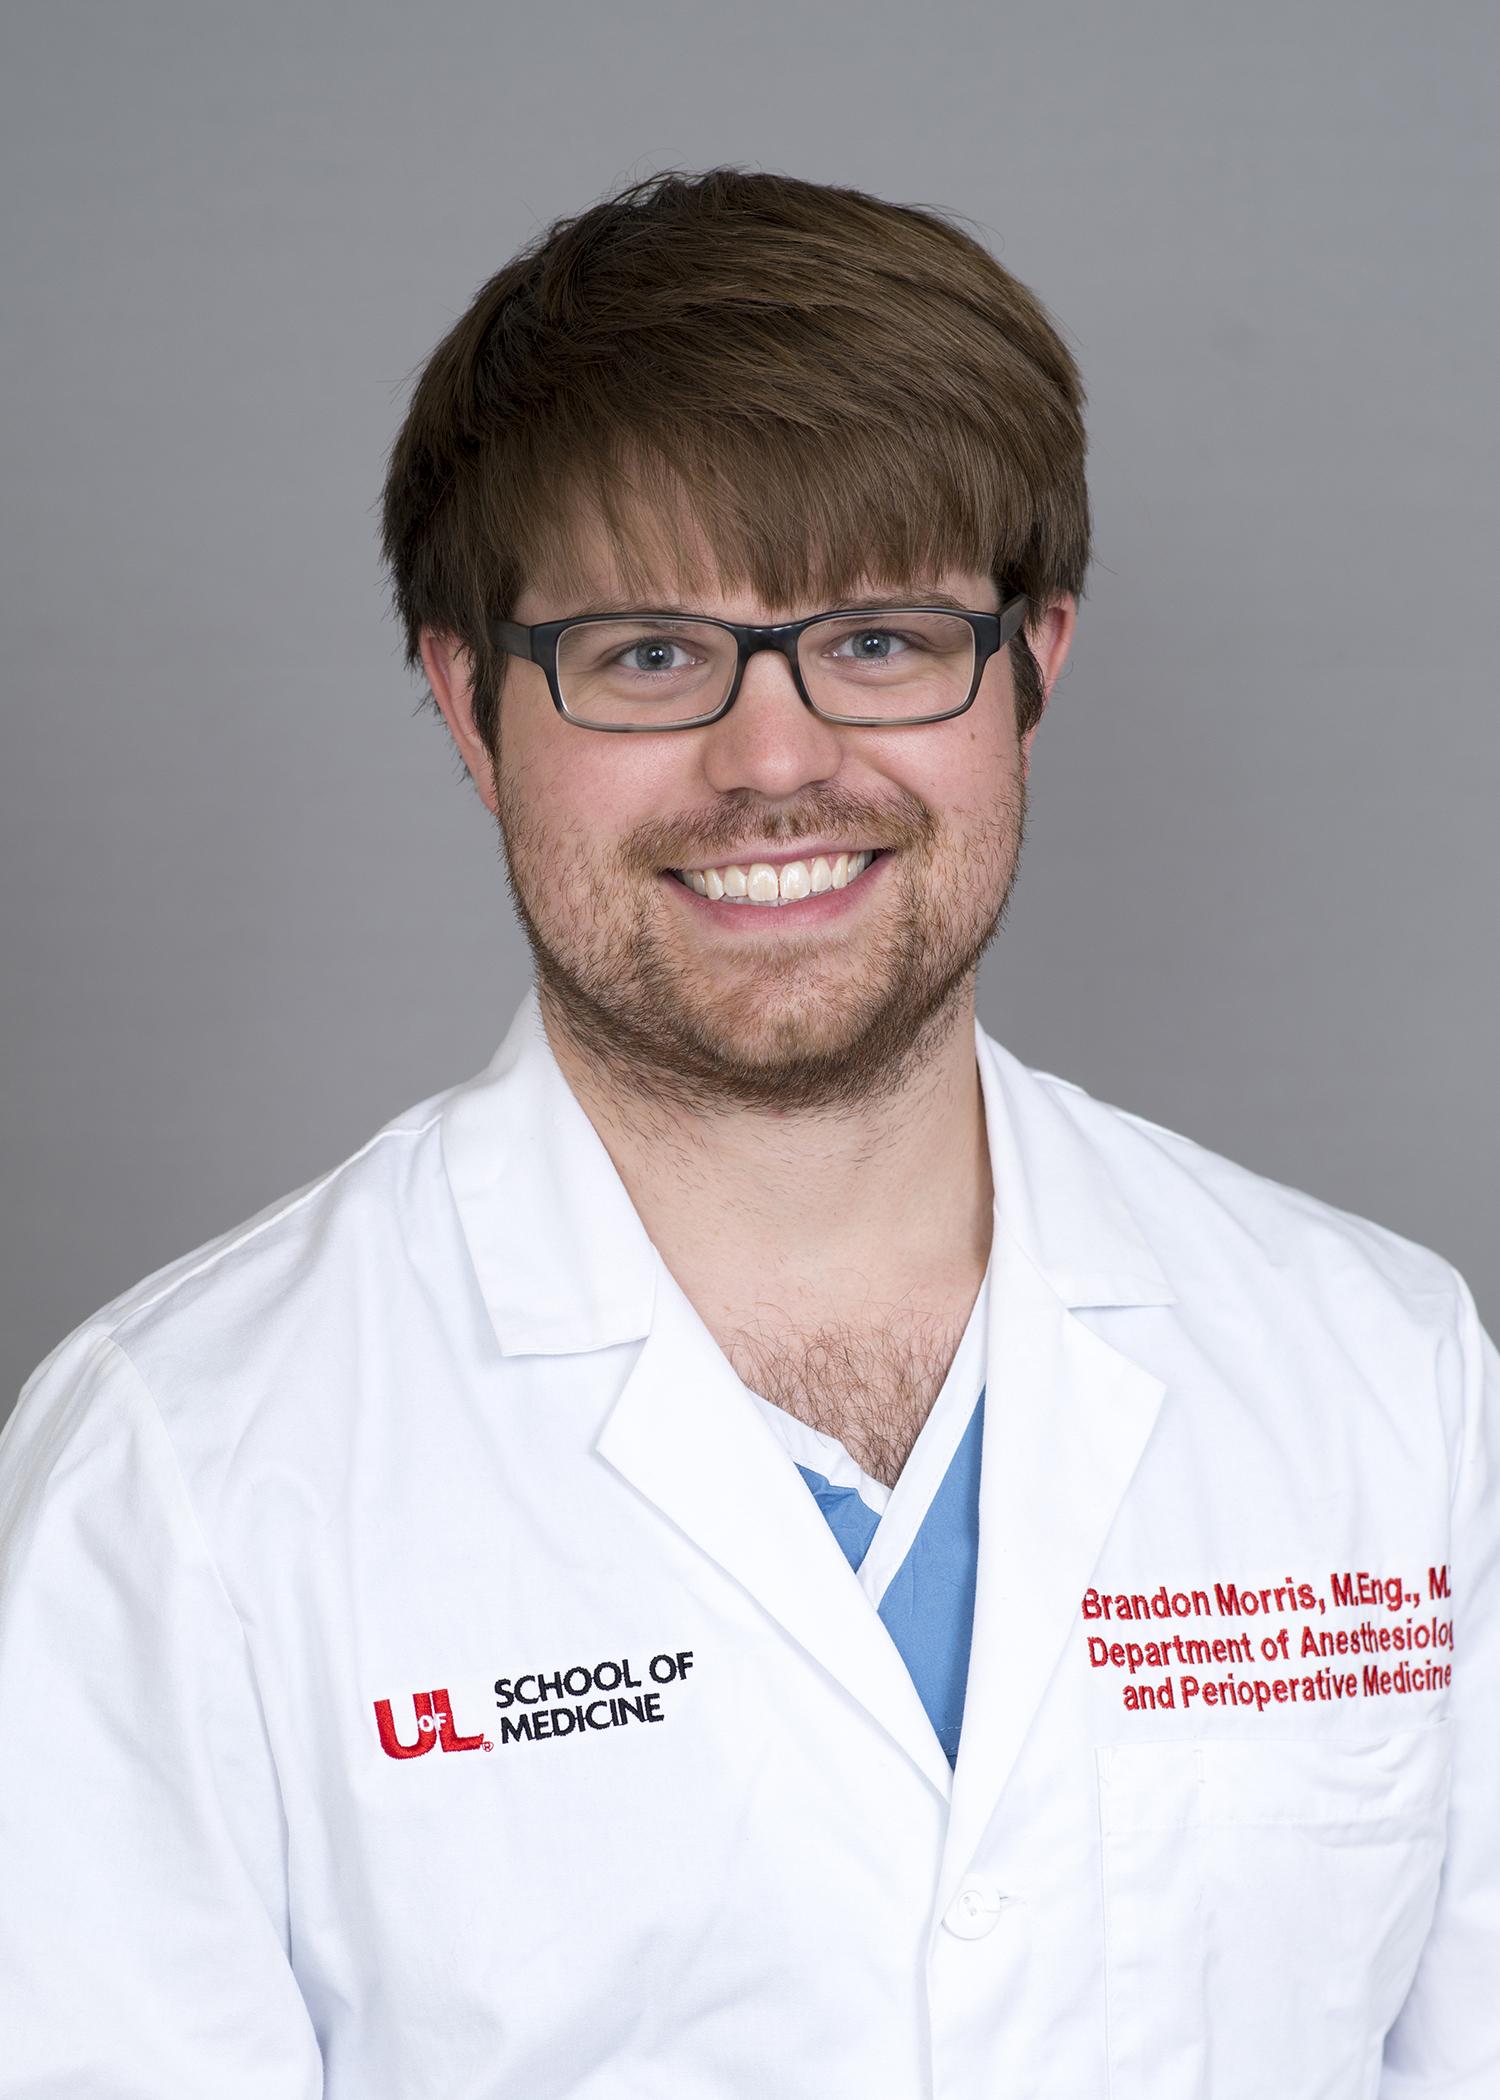 Dr. Brandon Morris